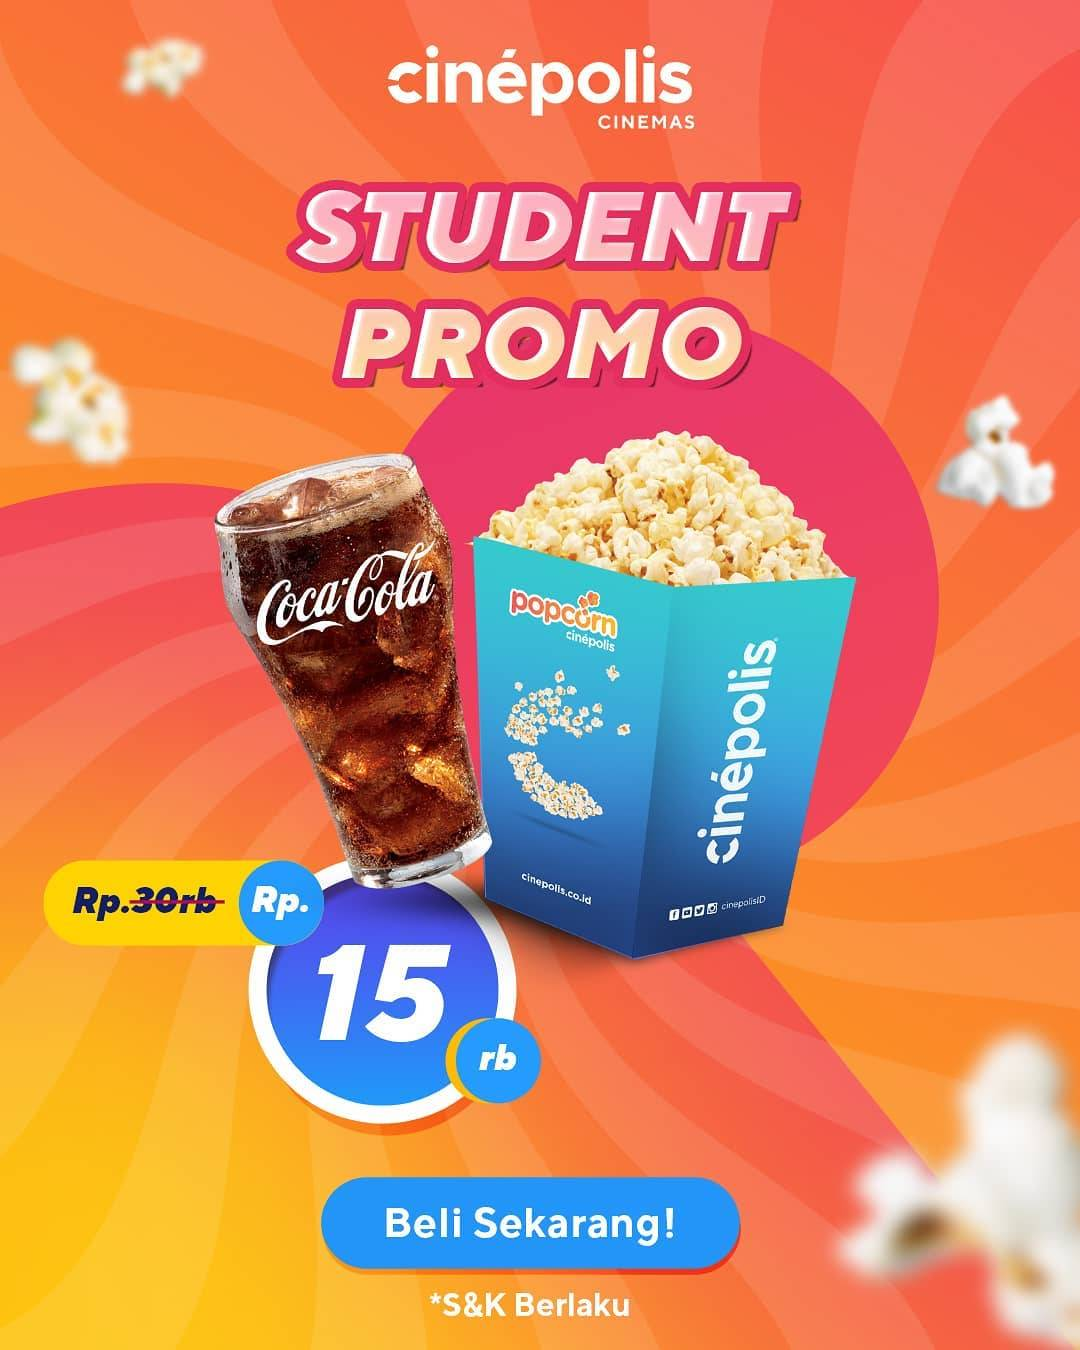 Diskon Cinepolis Student Promo Popcorn + Soft Drink Only For Rp. 15.000